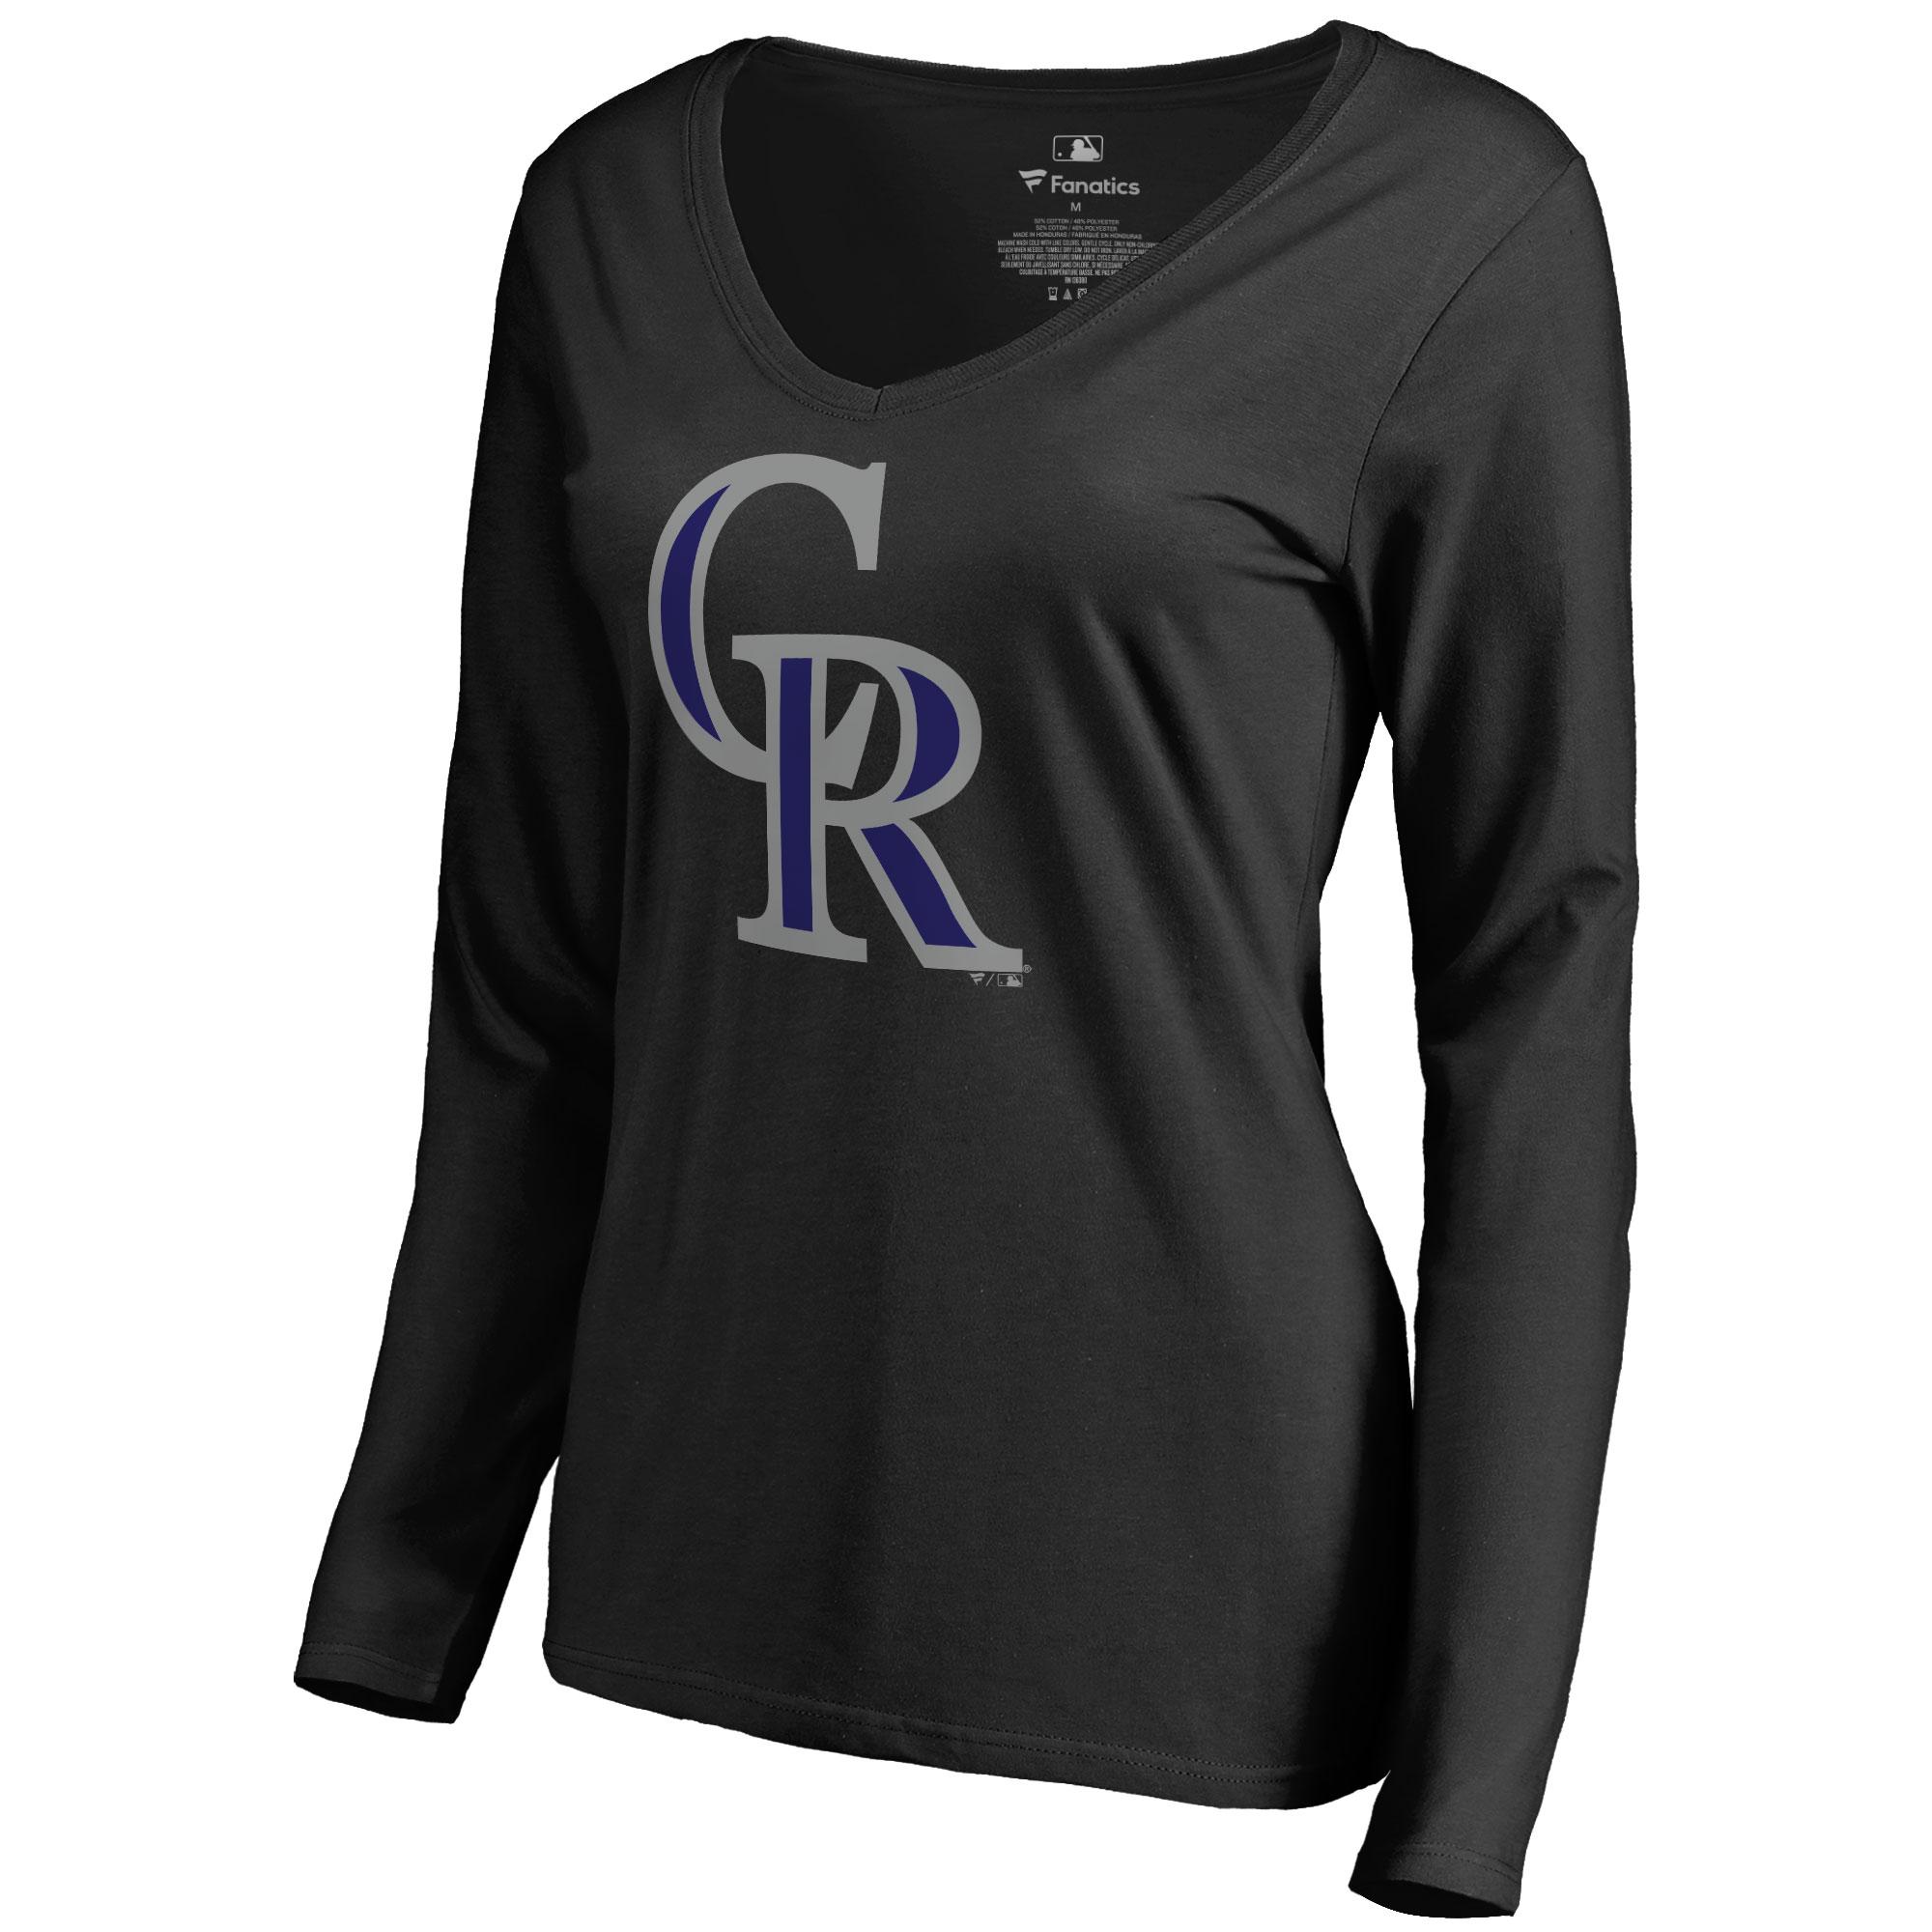 Colorado Rockies Women's Team Color Primary Logo V-Neck Long Sleeve T-Shirt - Black